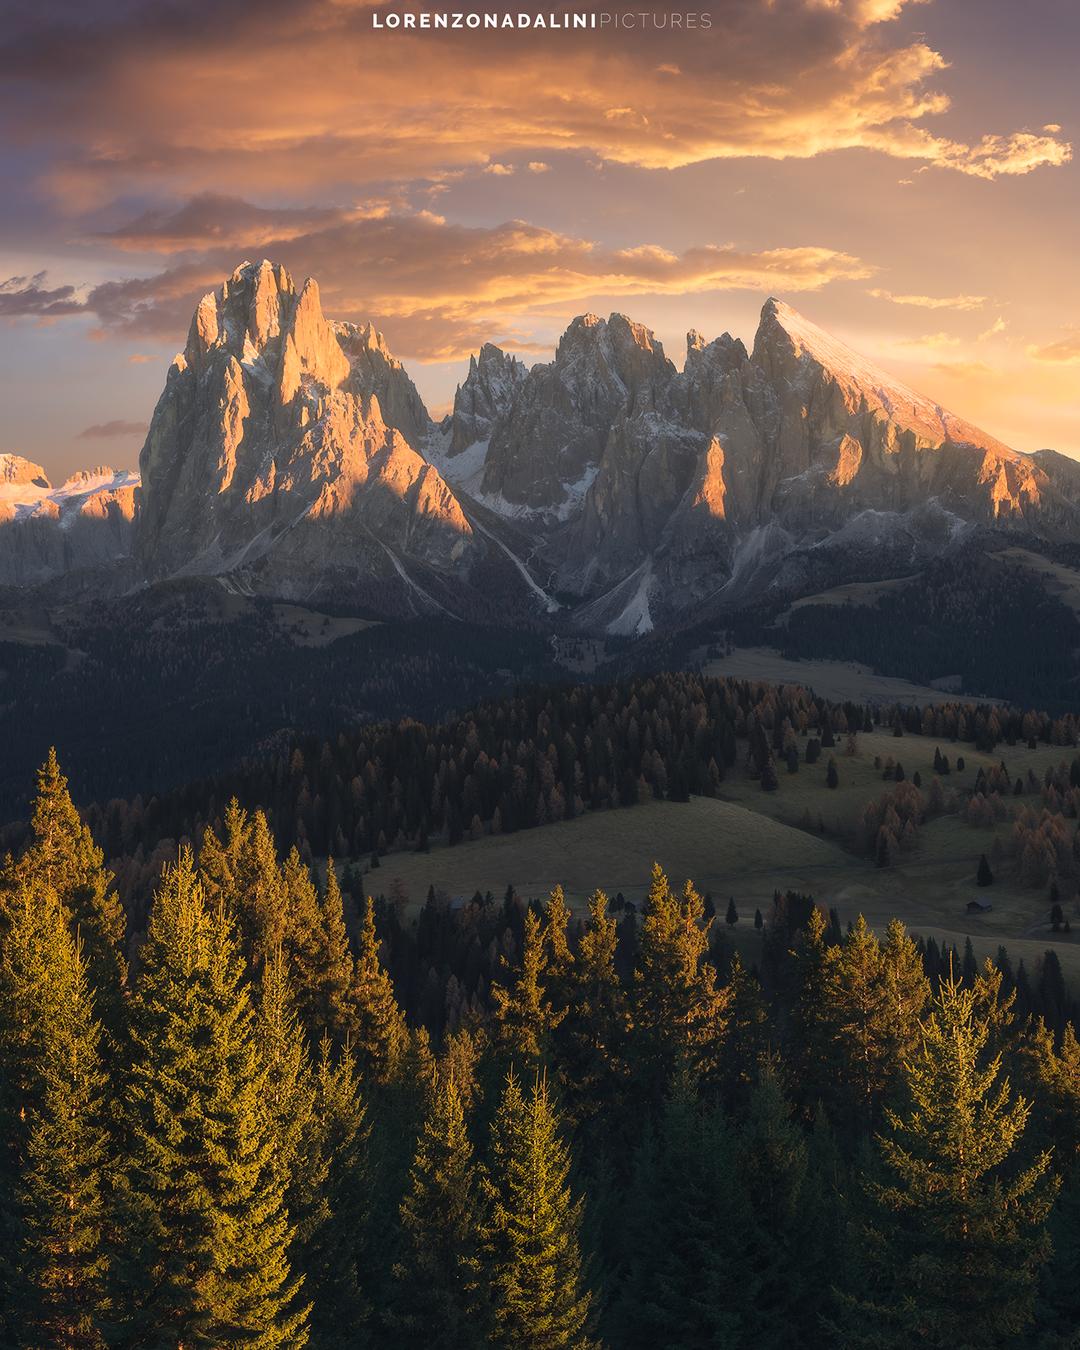 Workshop-fotografico-Alpe-di-Siusi-fotografia-landscape-Lorenzo-Nadalini